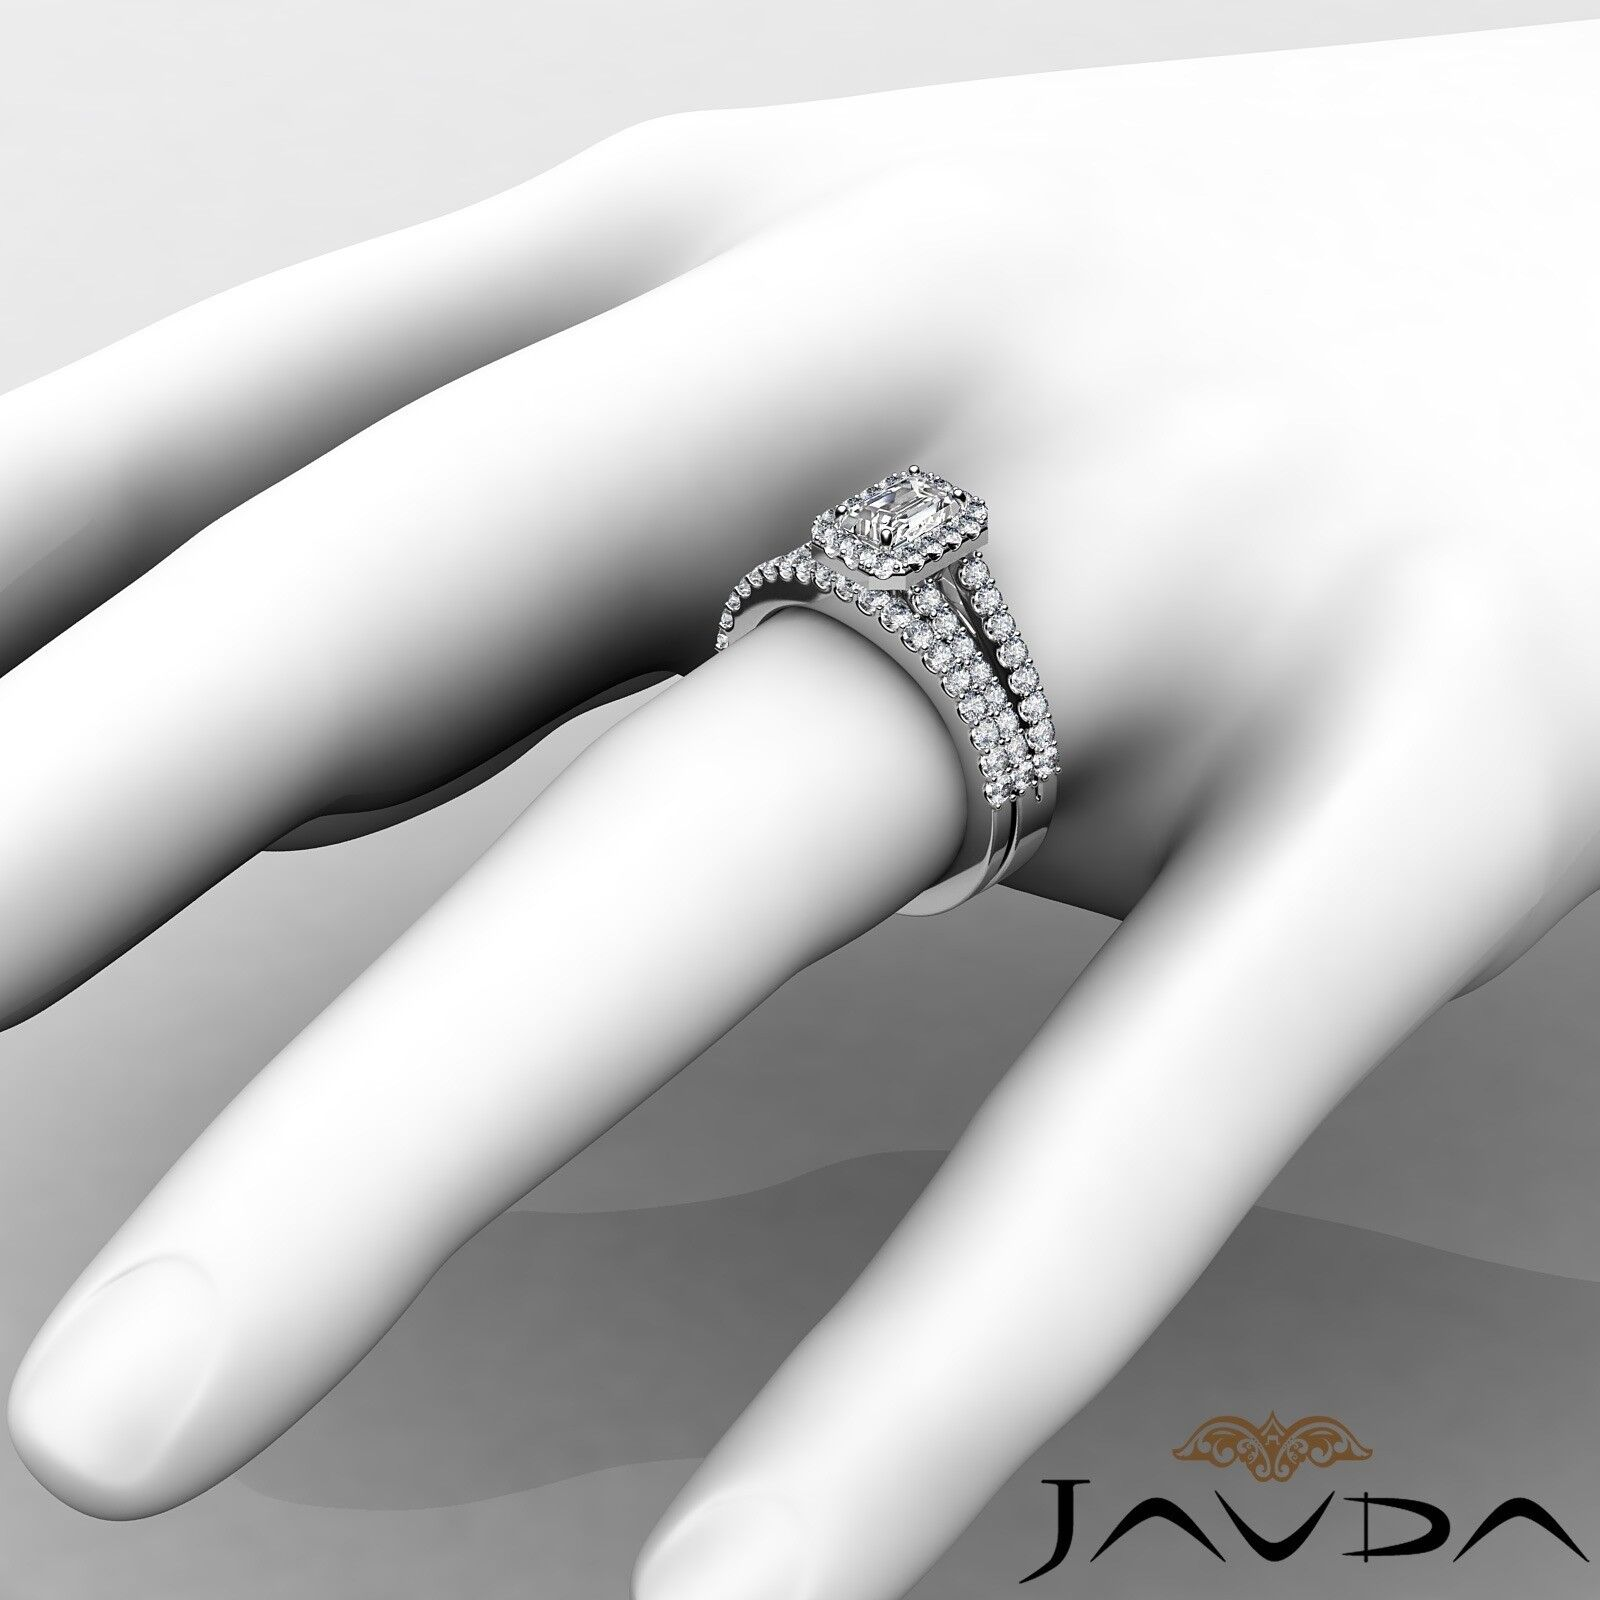 1.75ctw Halo Sidestone Bridal Emerald Diamond Engagement Ring GIA H-VS2 W Gold 4